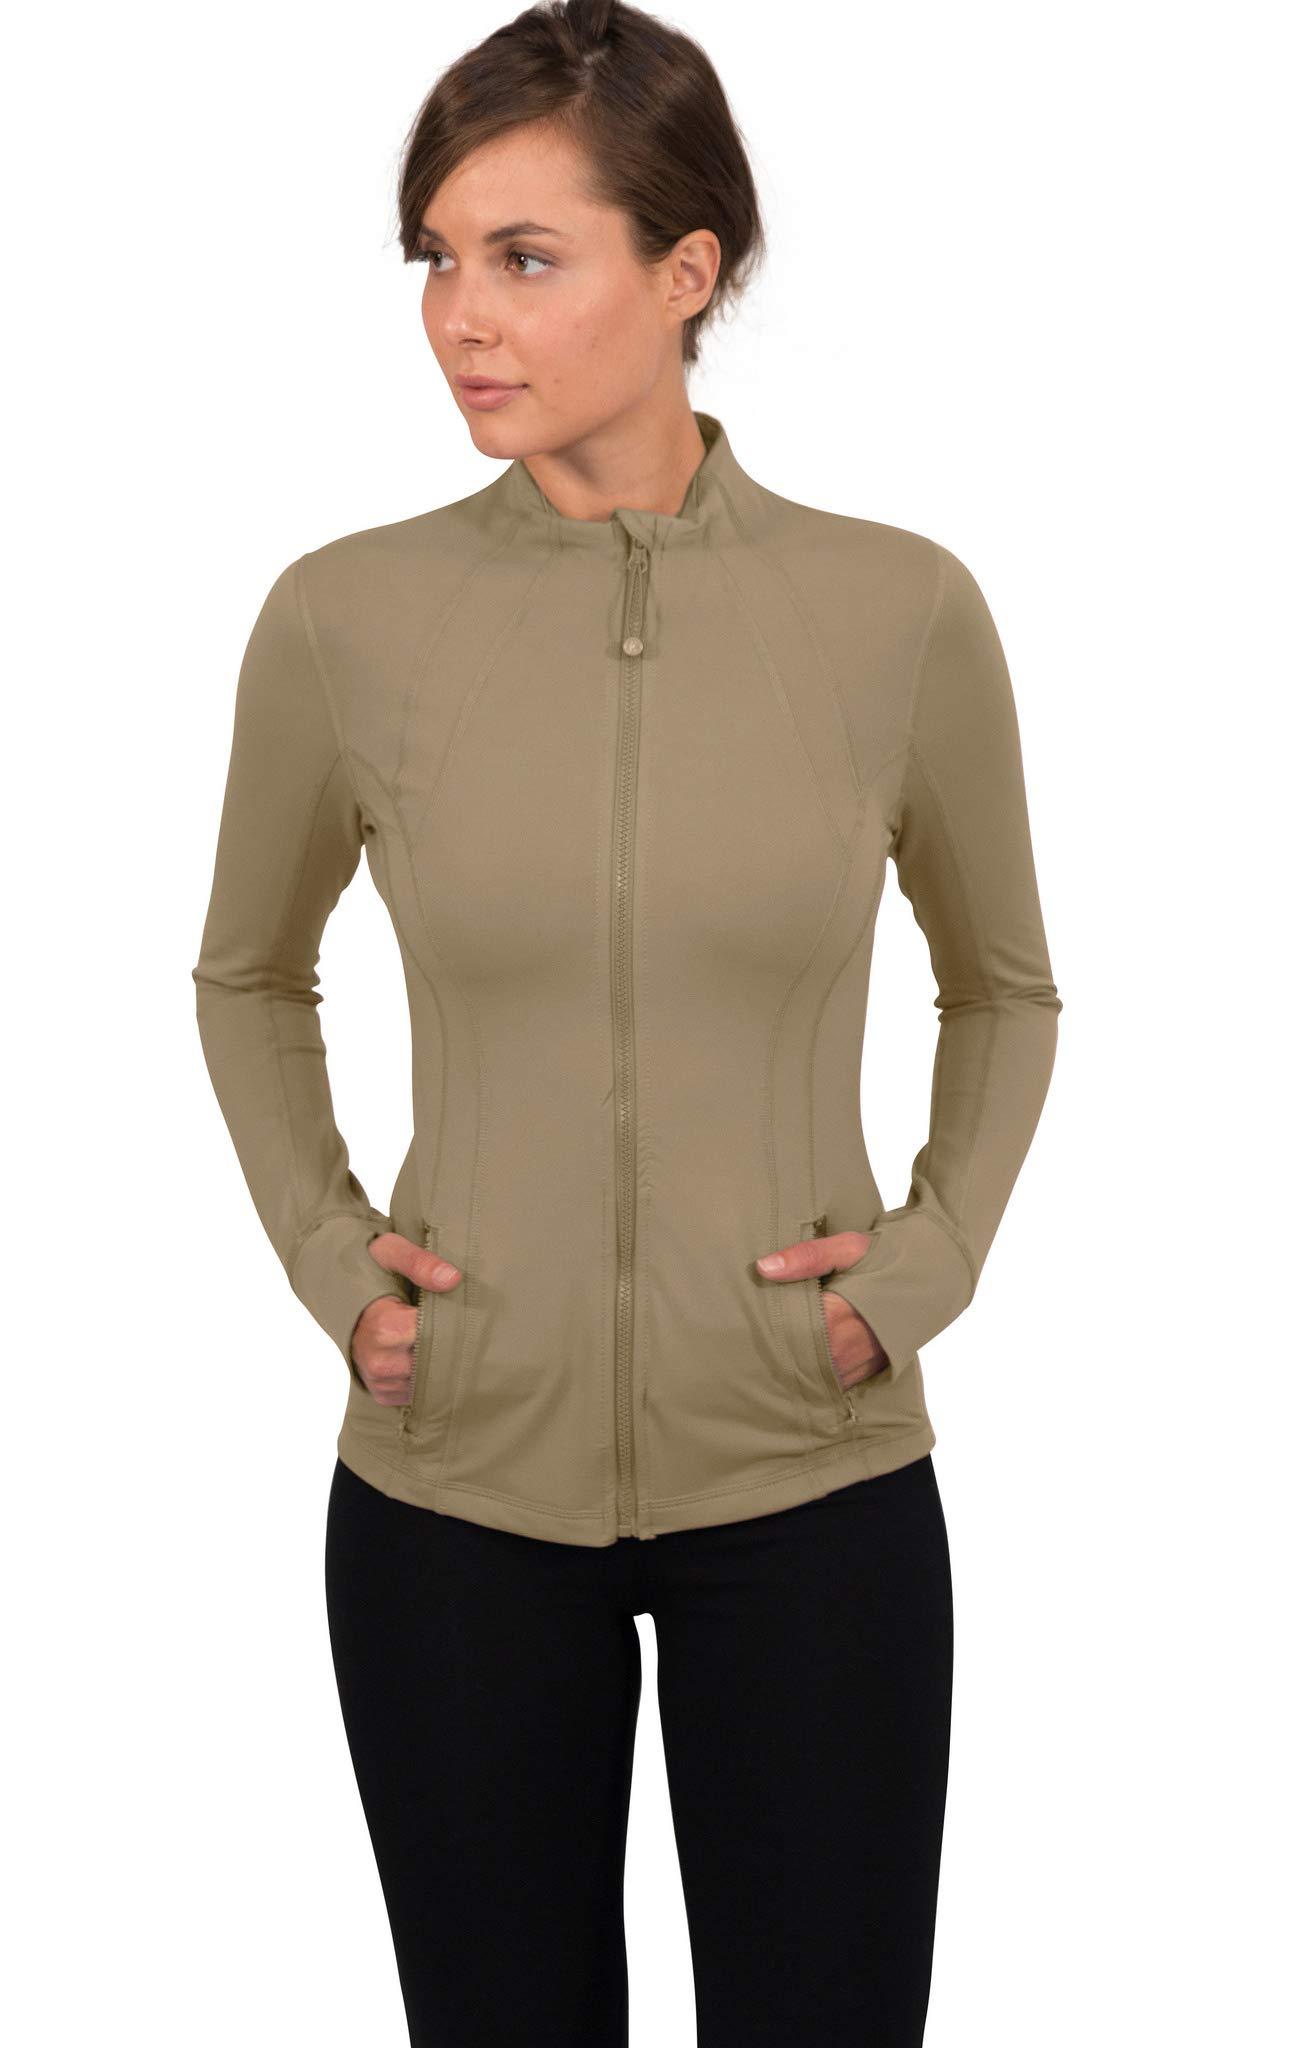 90 Degree By Reflex Women's Lightweight, Full Zip Running Track Jacket - Camel - Medium by 90 Degree By Reflex